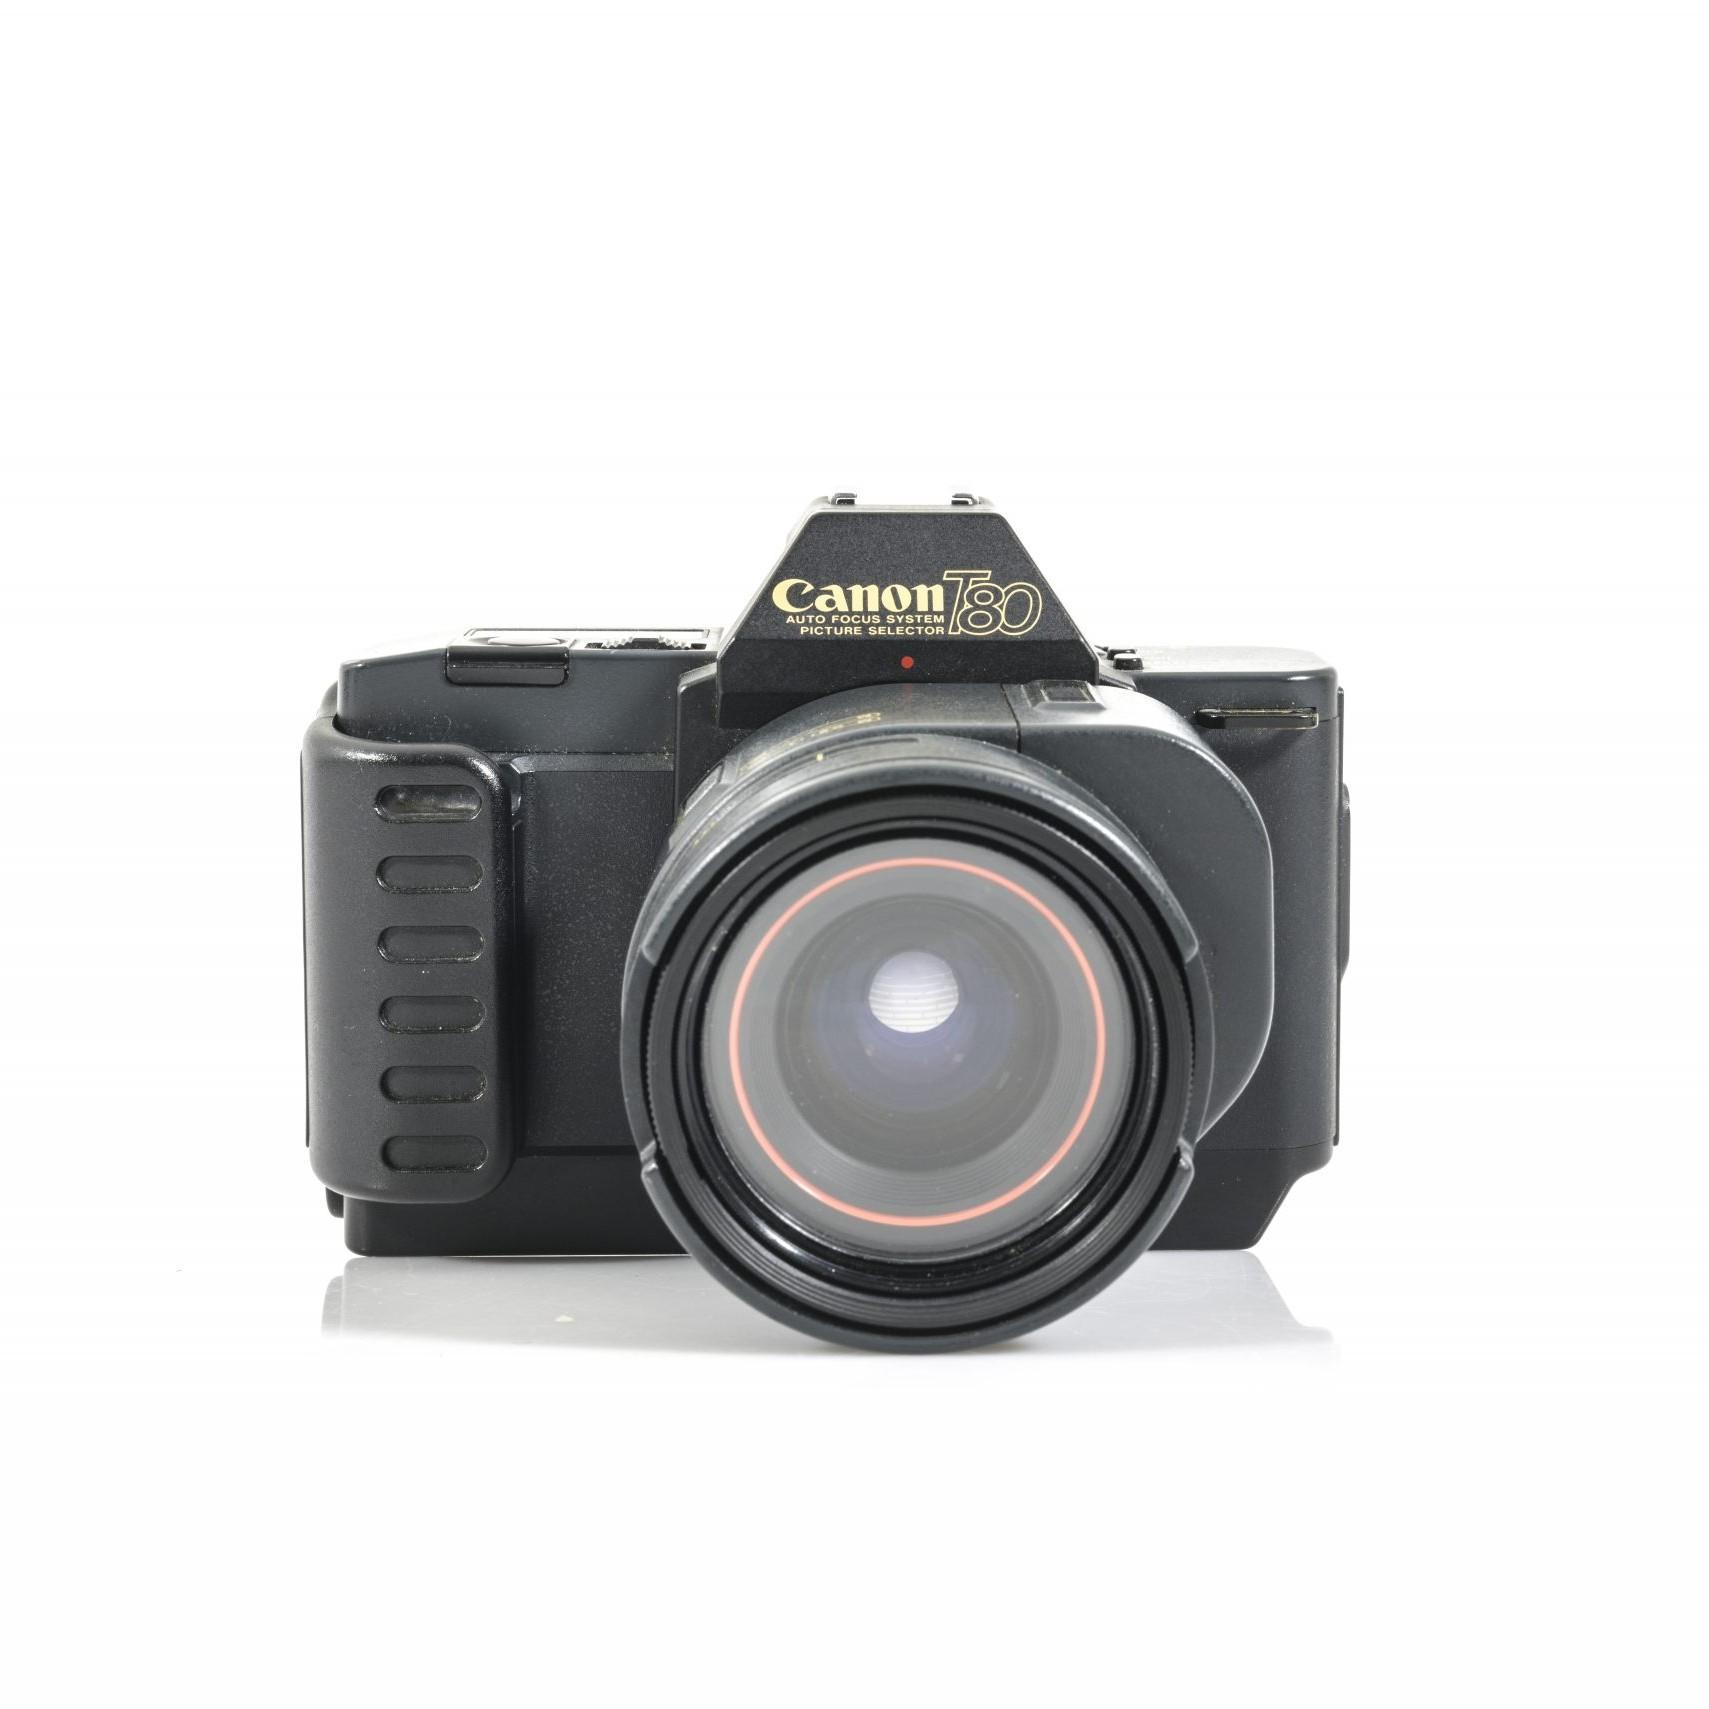 Canon T80 35mm Film SLR Camera + FD AC 35-70mm F/3.5-4.5 Zoom Auto Focus Lens